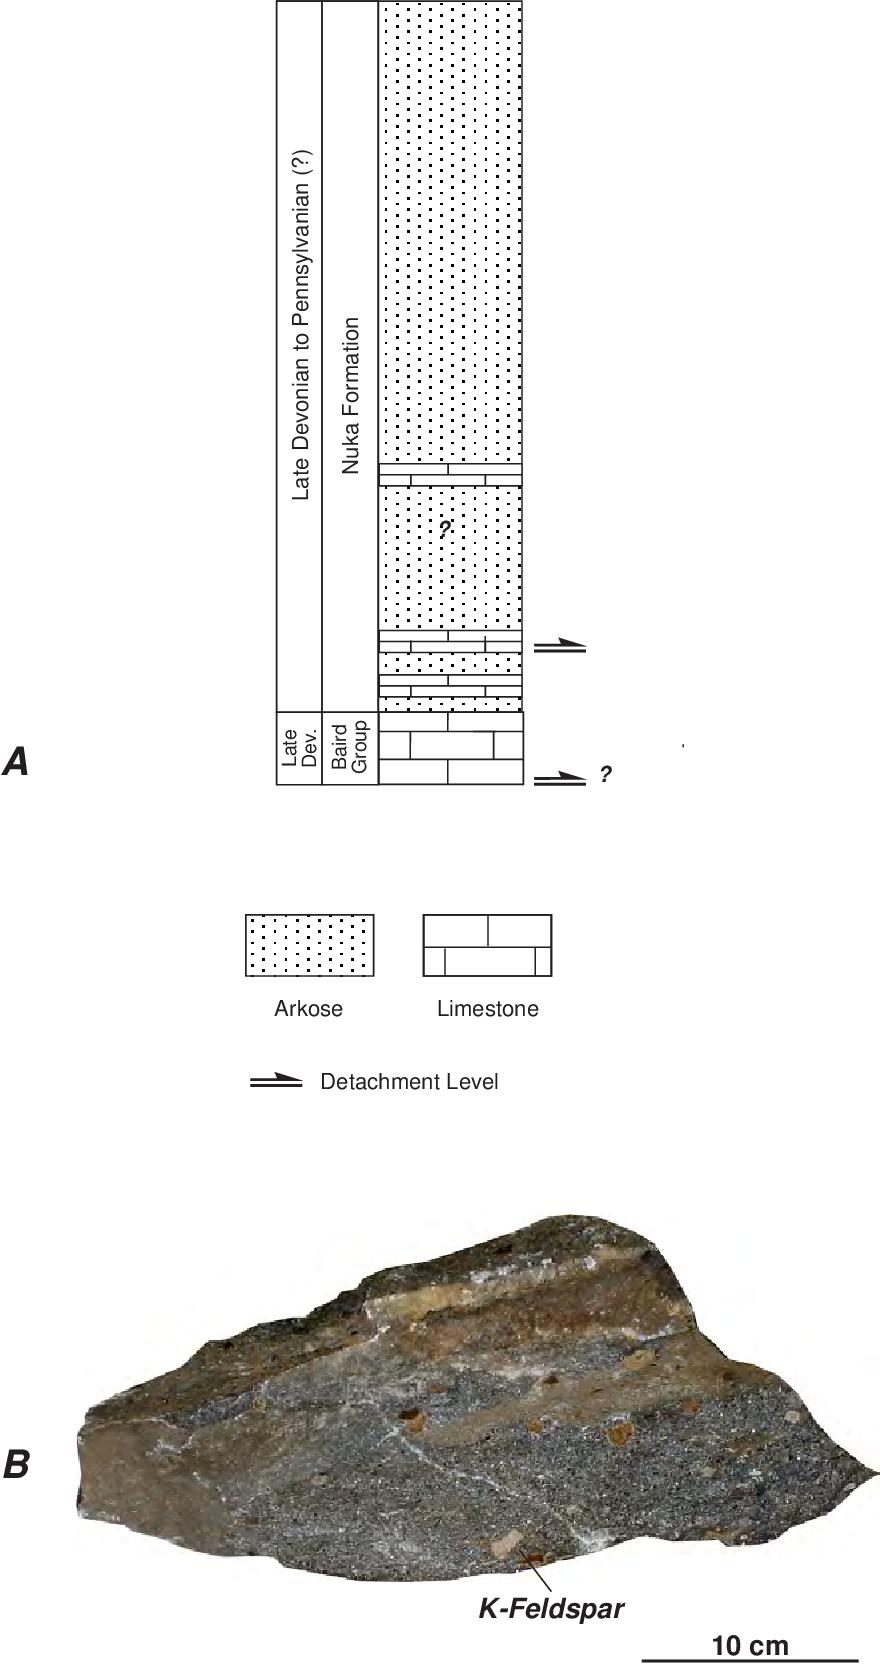 figure 5.28